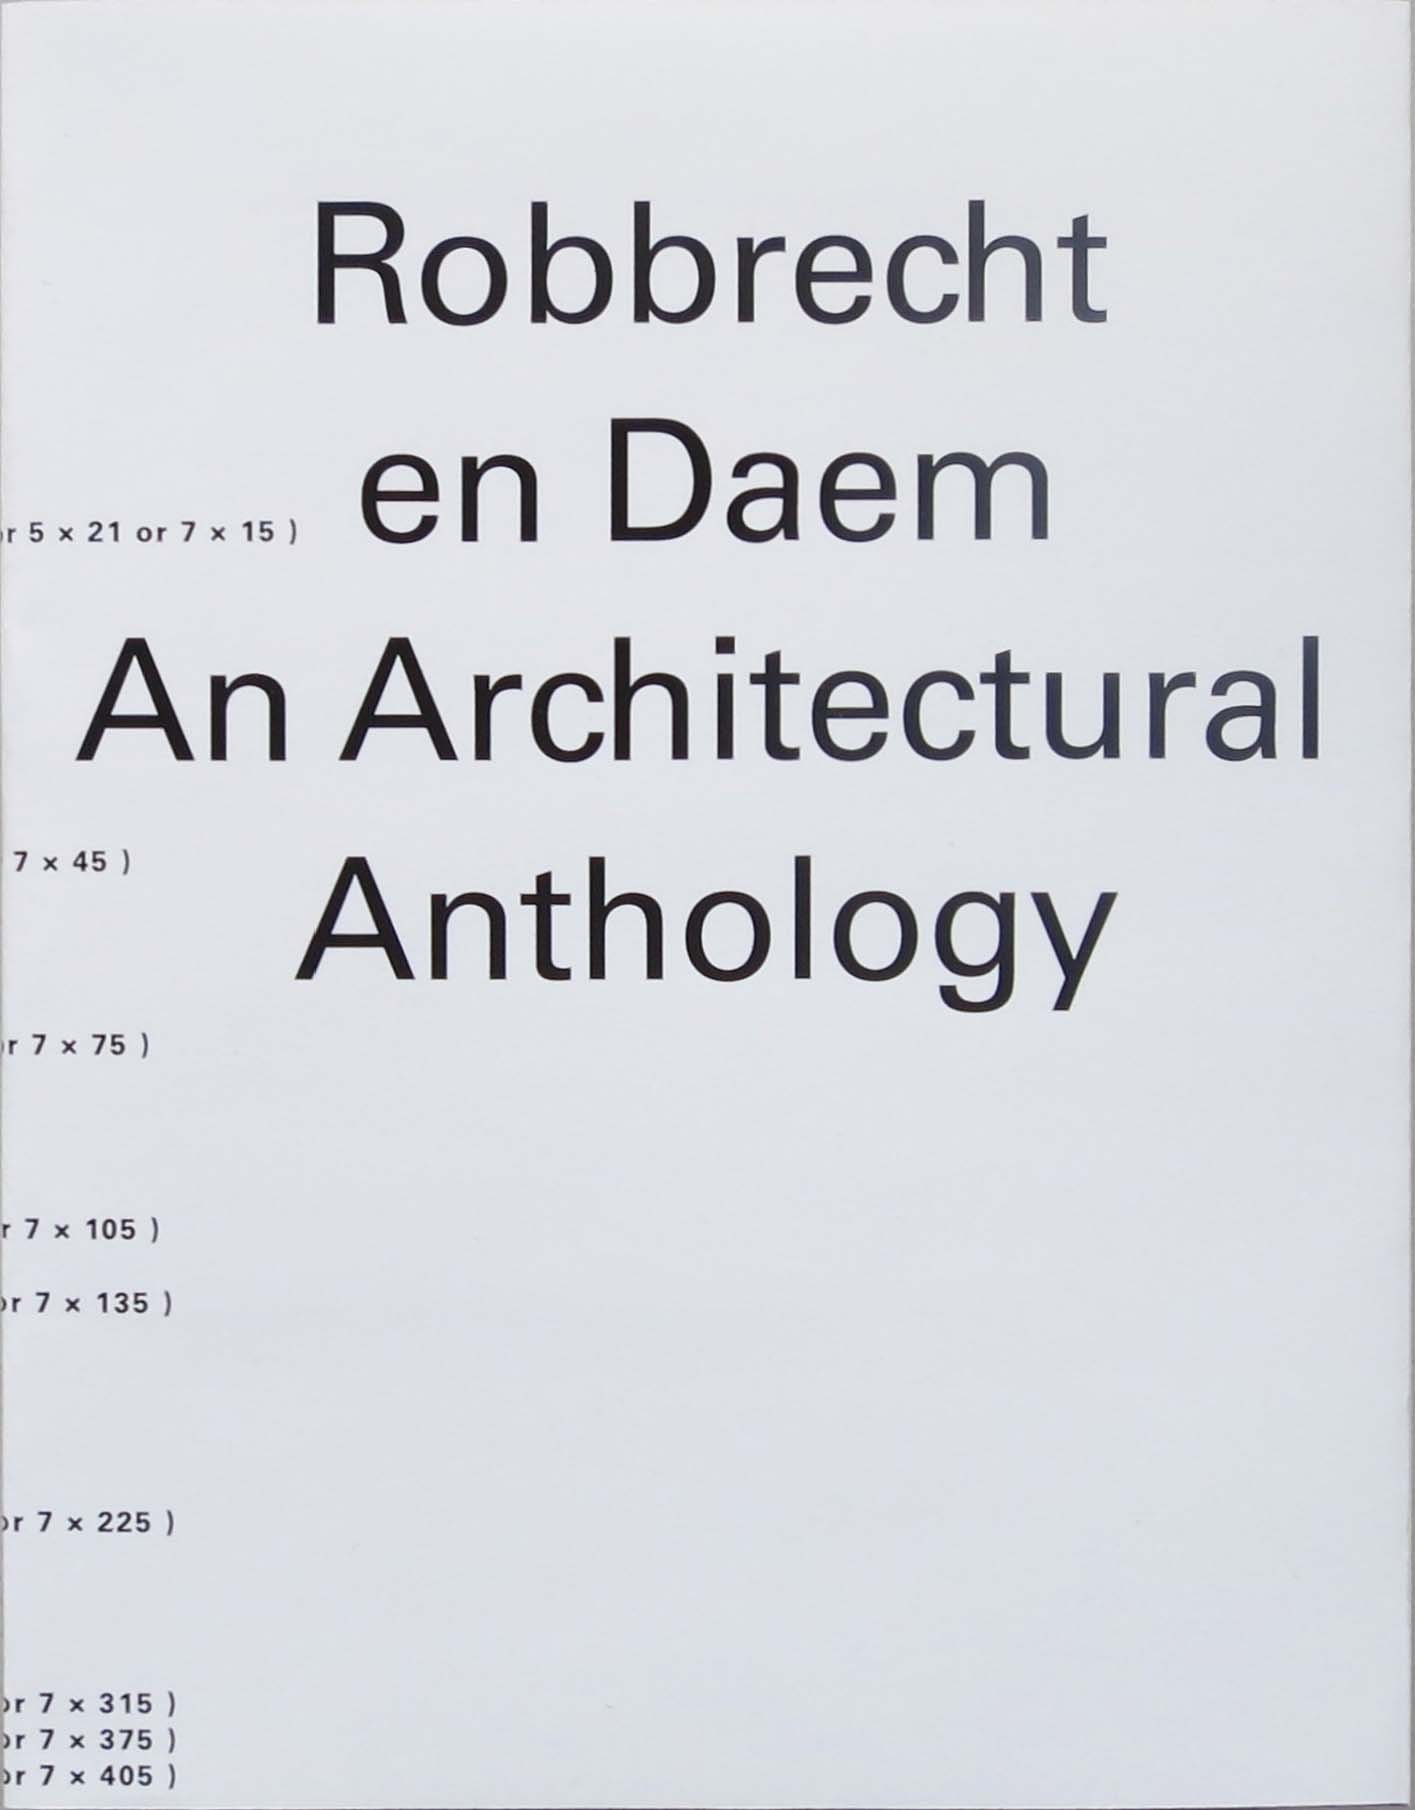 Robbrecht en Daem: An Architectural Anthology PDF